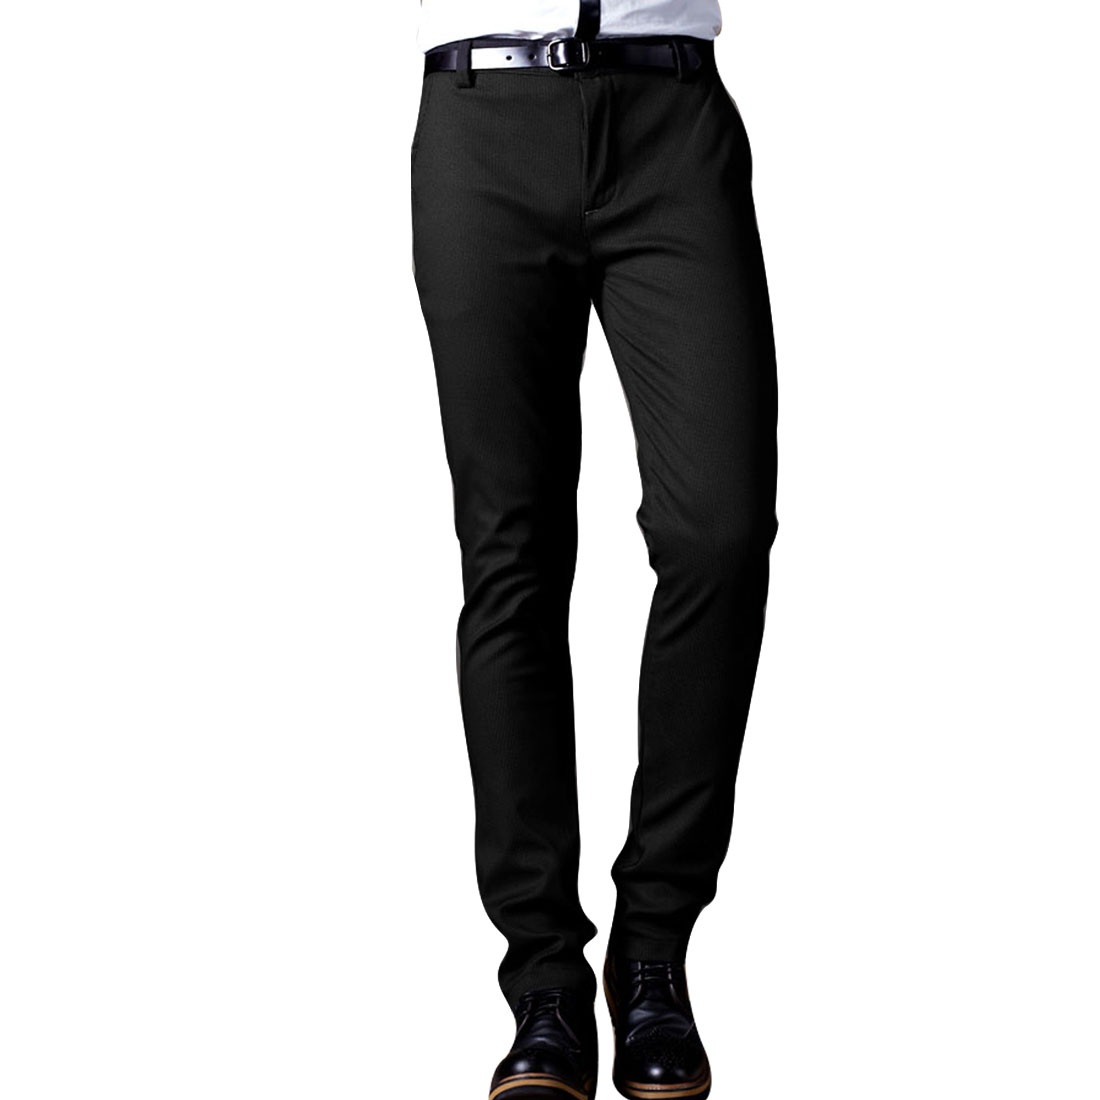 Black Micro Check Belt Loops Zip Fly Slant Pockets Pants Man W29